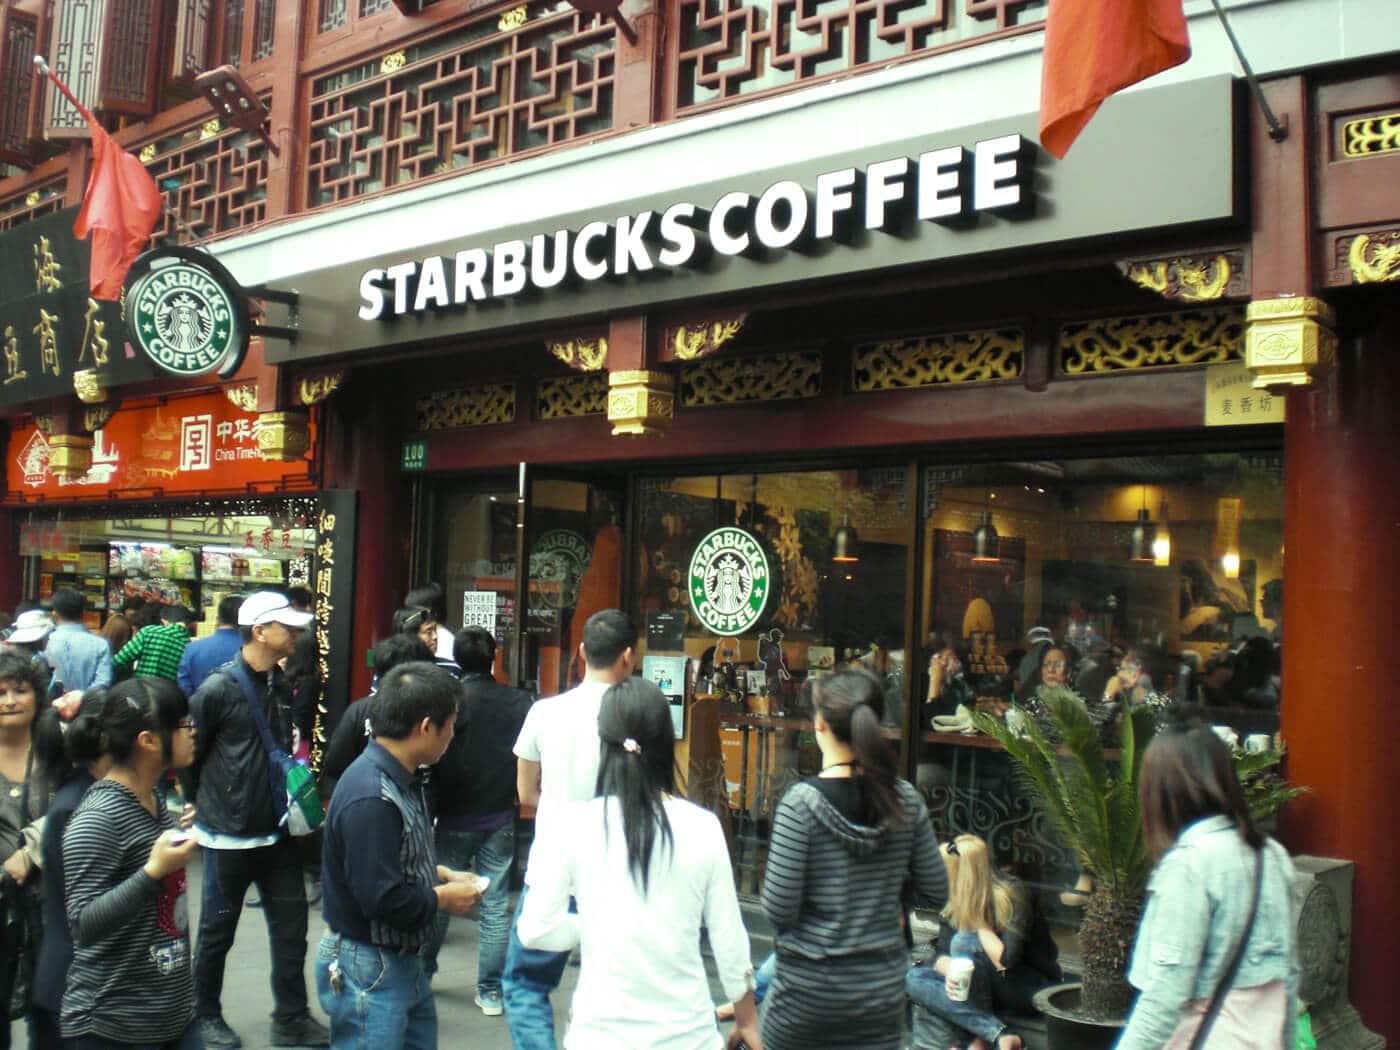 global coffee giant Starbucks in China - food tech news in Asia